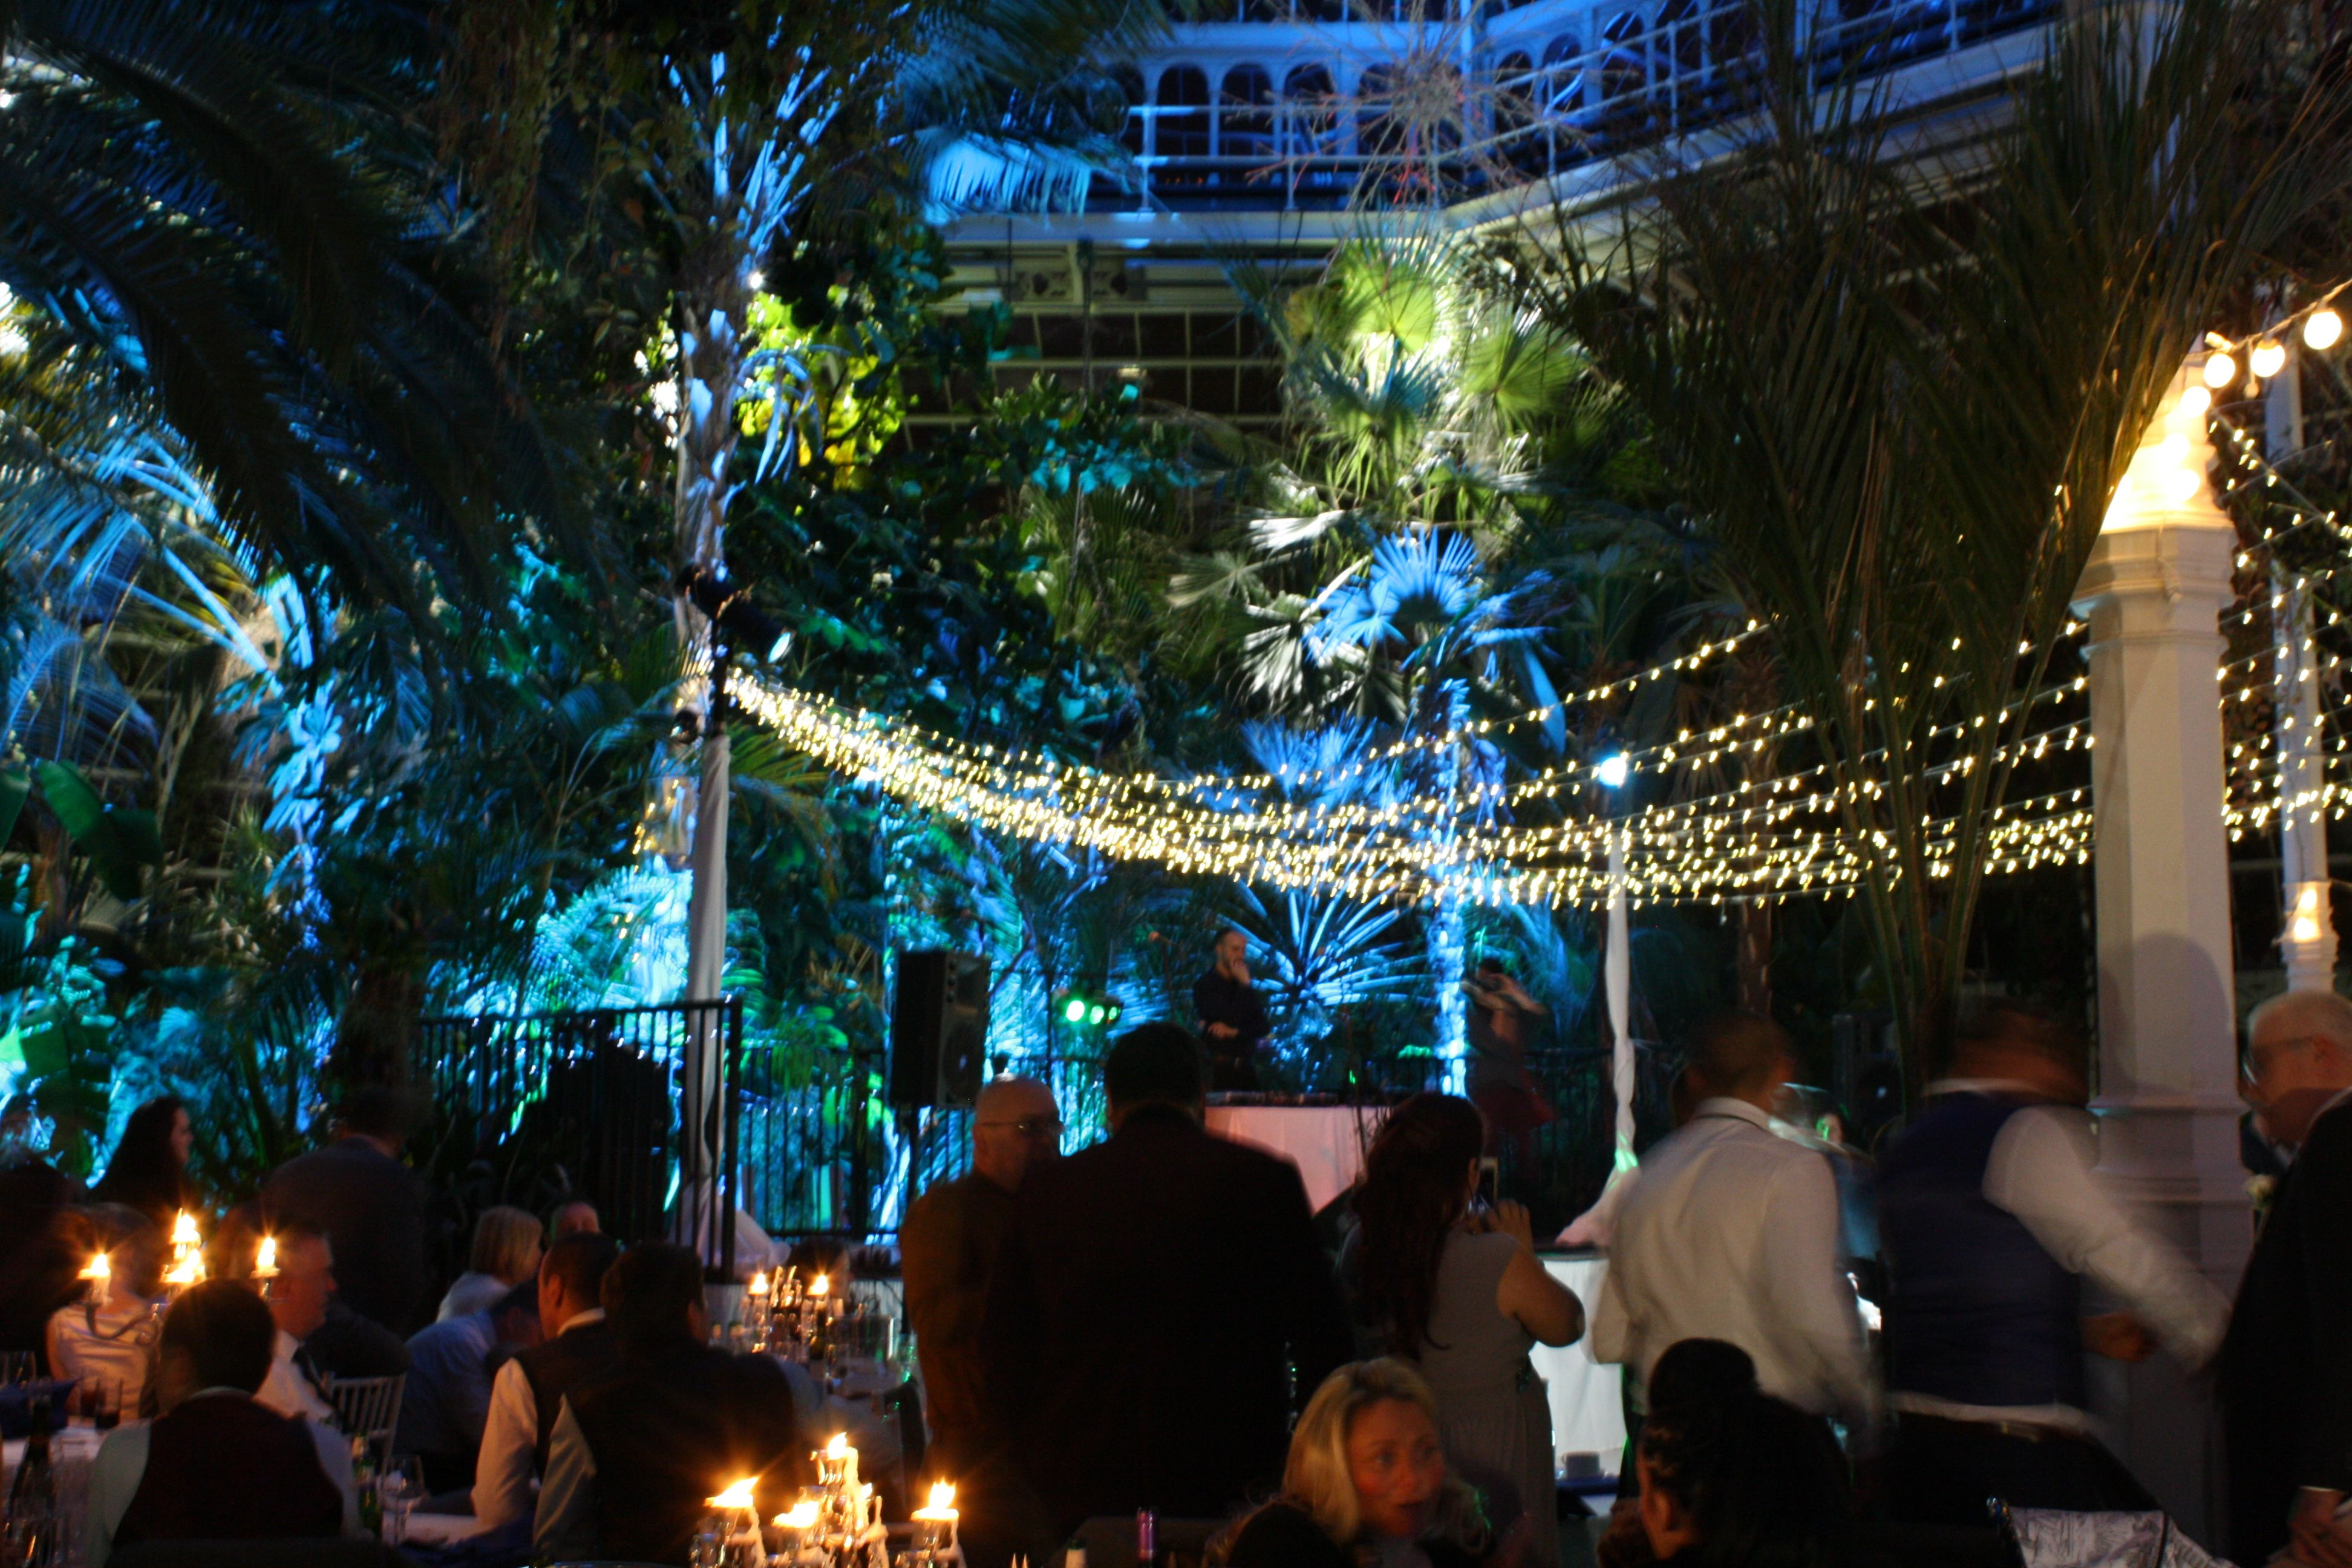 Winter Wedding Lighting Backdrop Sefton Palm House